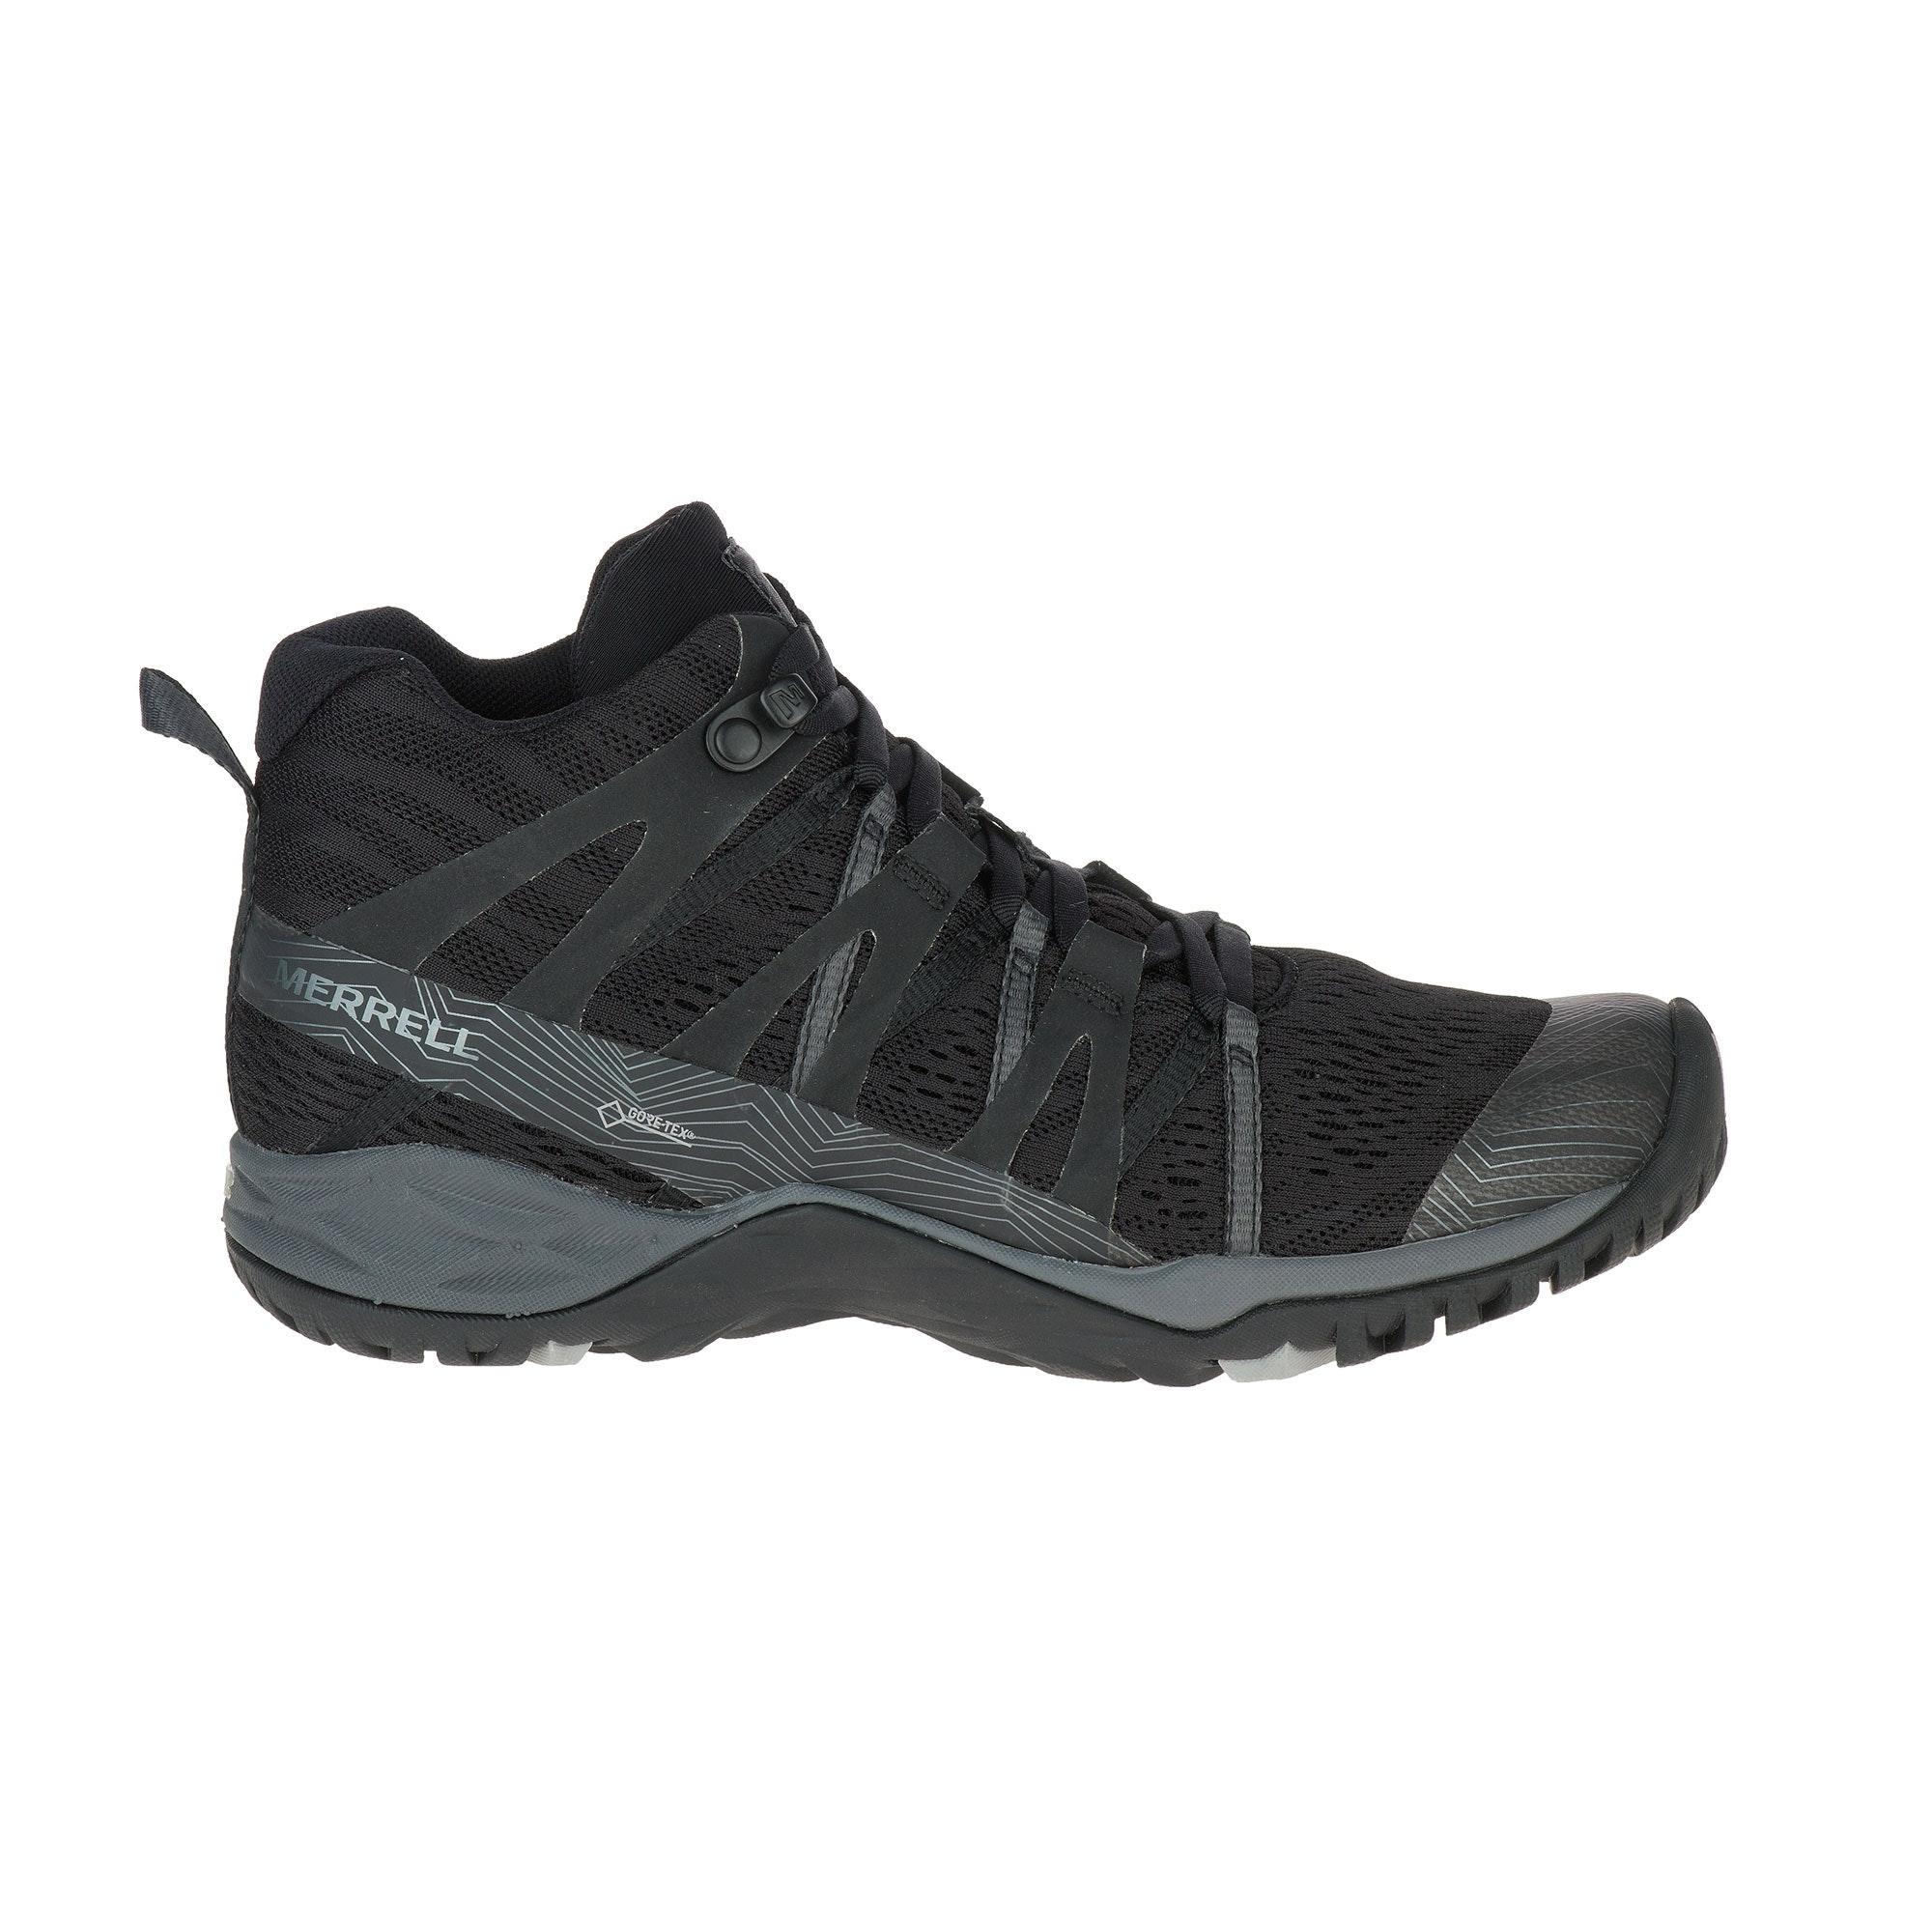 767cc92291 Merrell Women's Siren Hex Q2 Mid E-Mesh Gore-Tex Hiking Boots